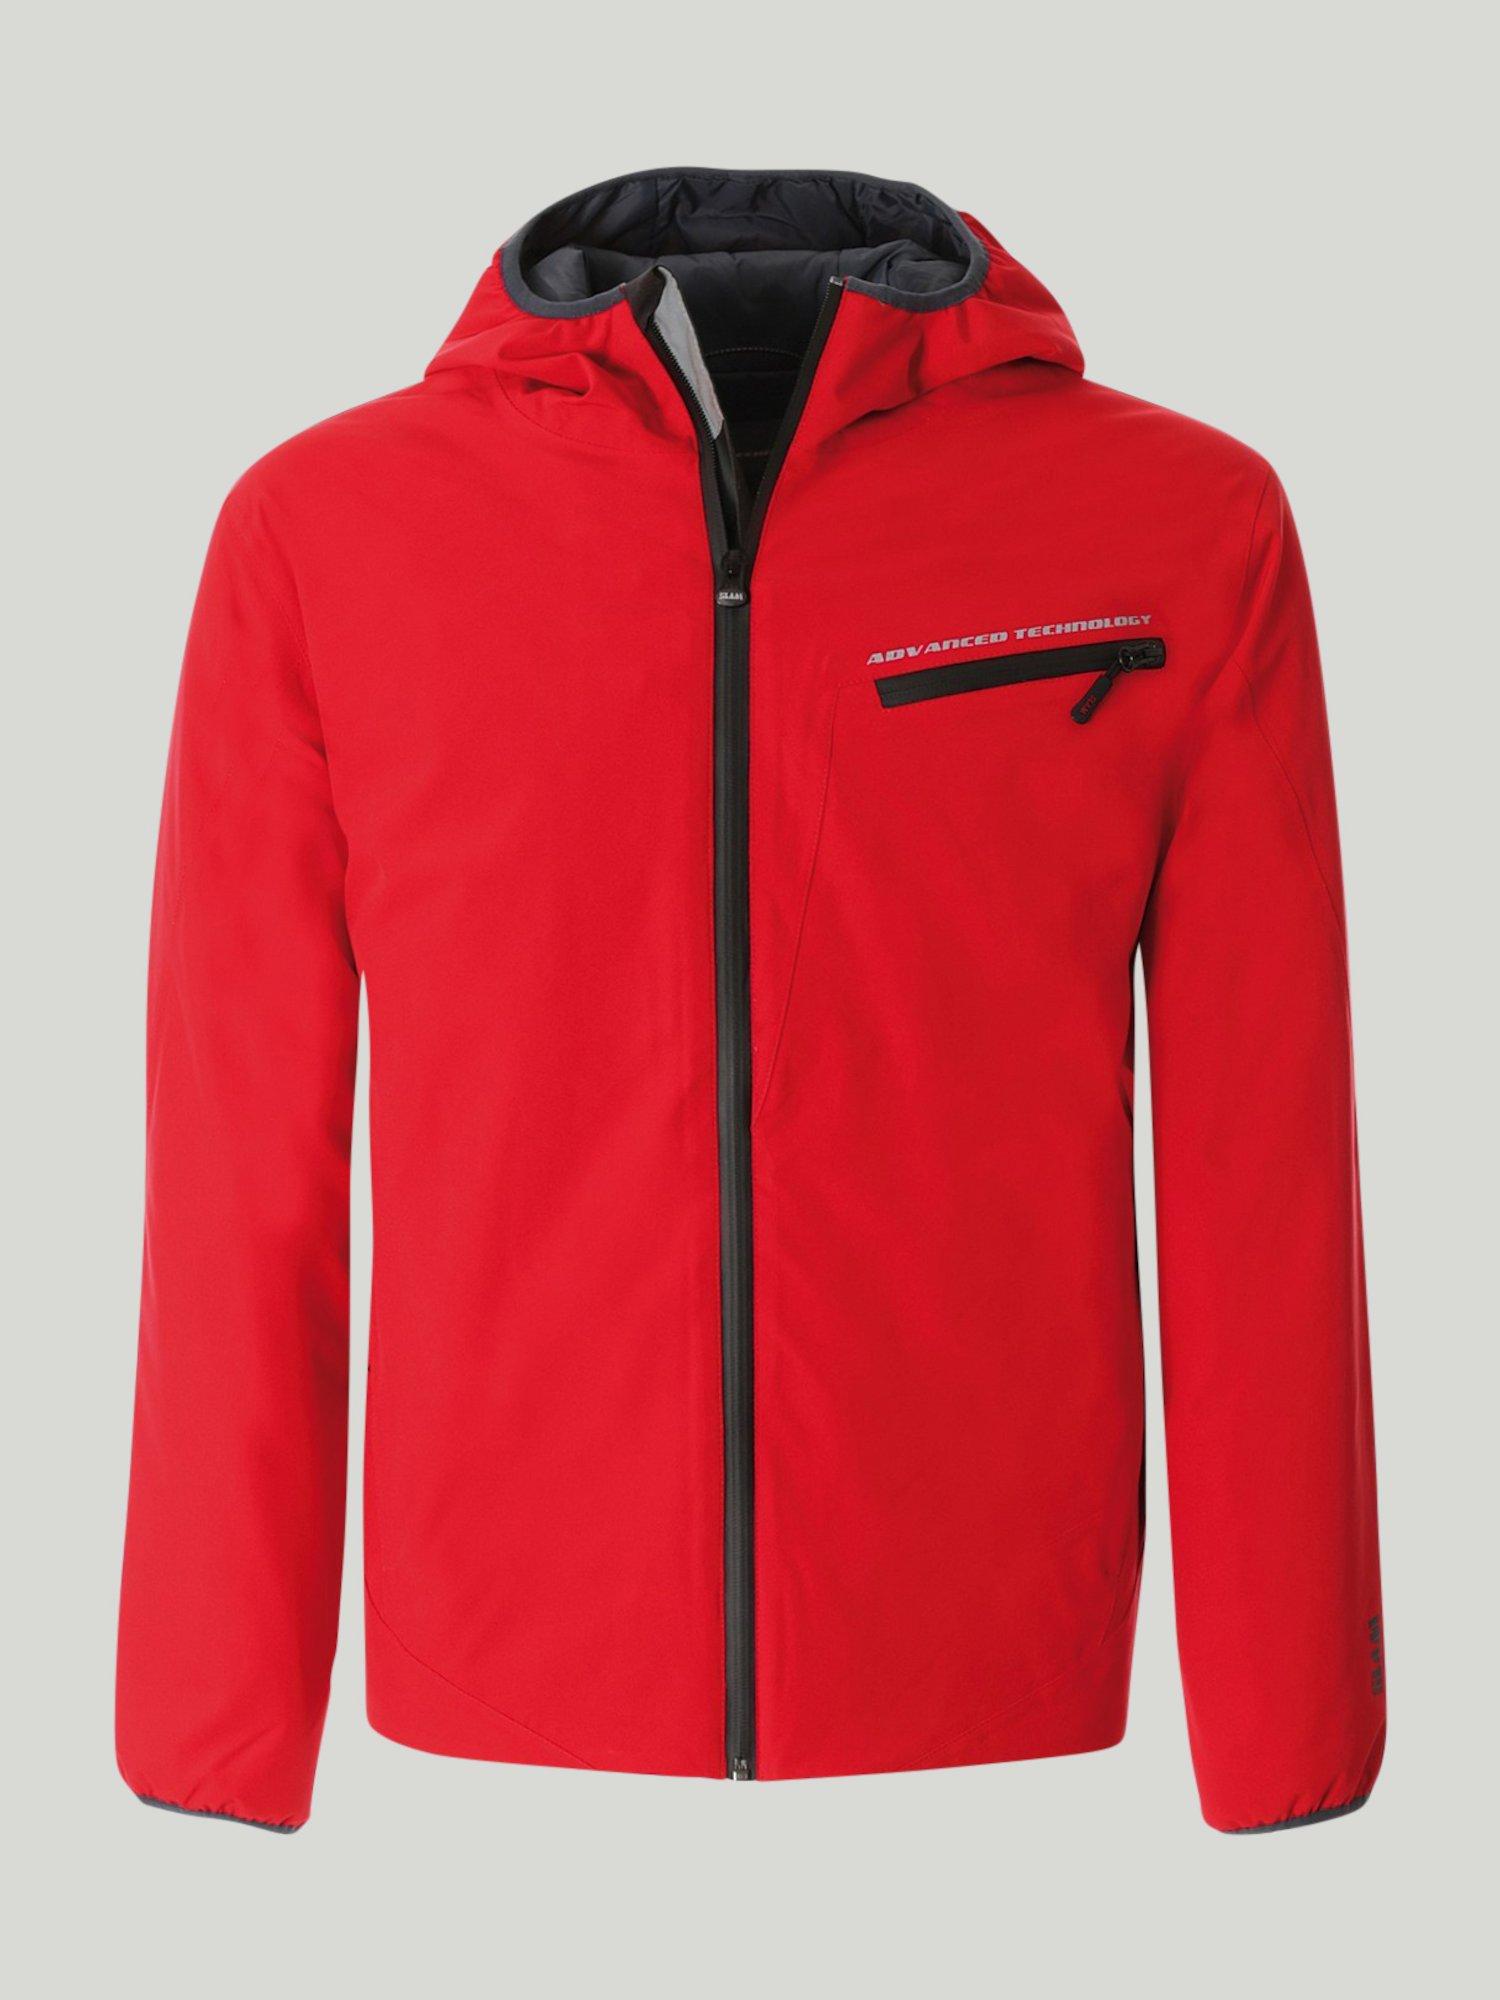 Doohan jacket - Flame Red